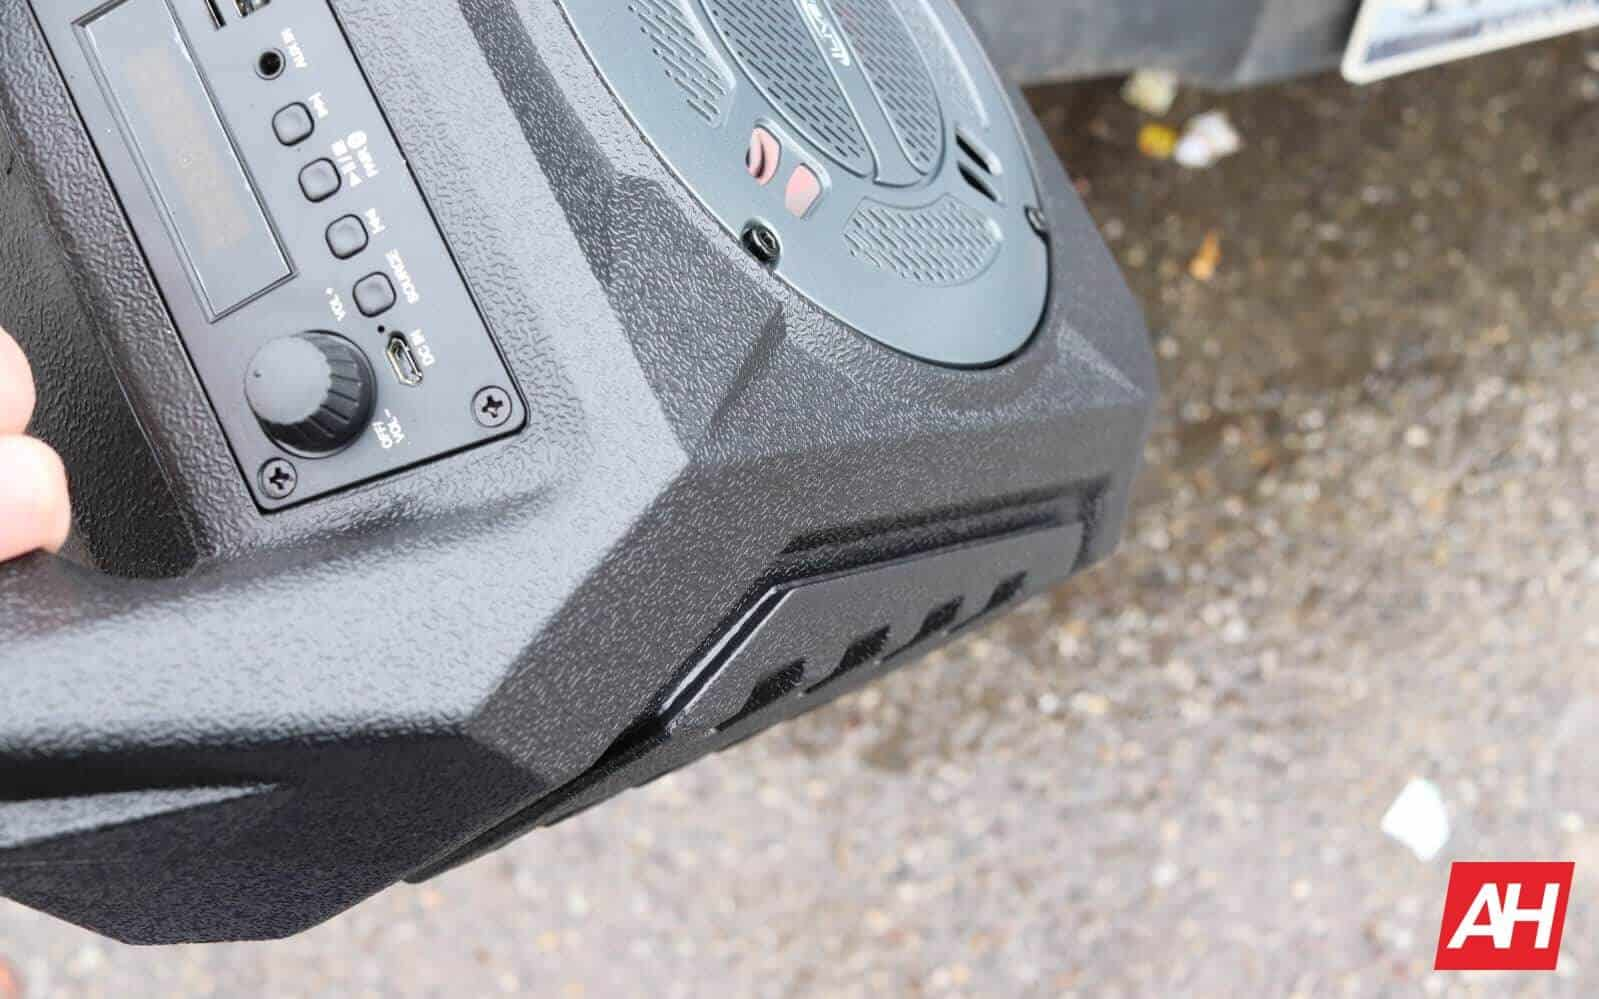 iLive Wireless Tailgate Speaker HARDWARE AH 2019 GLLRY 03